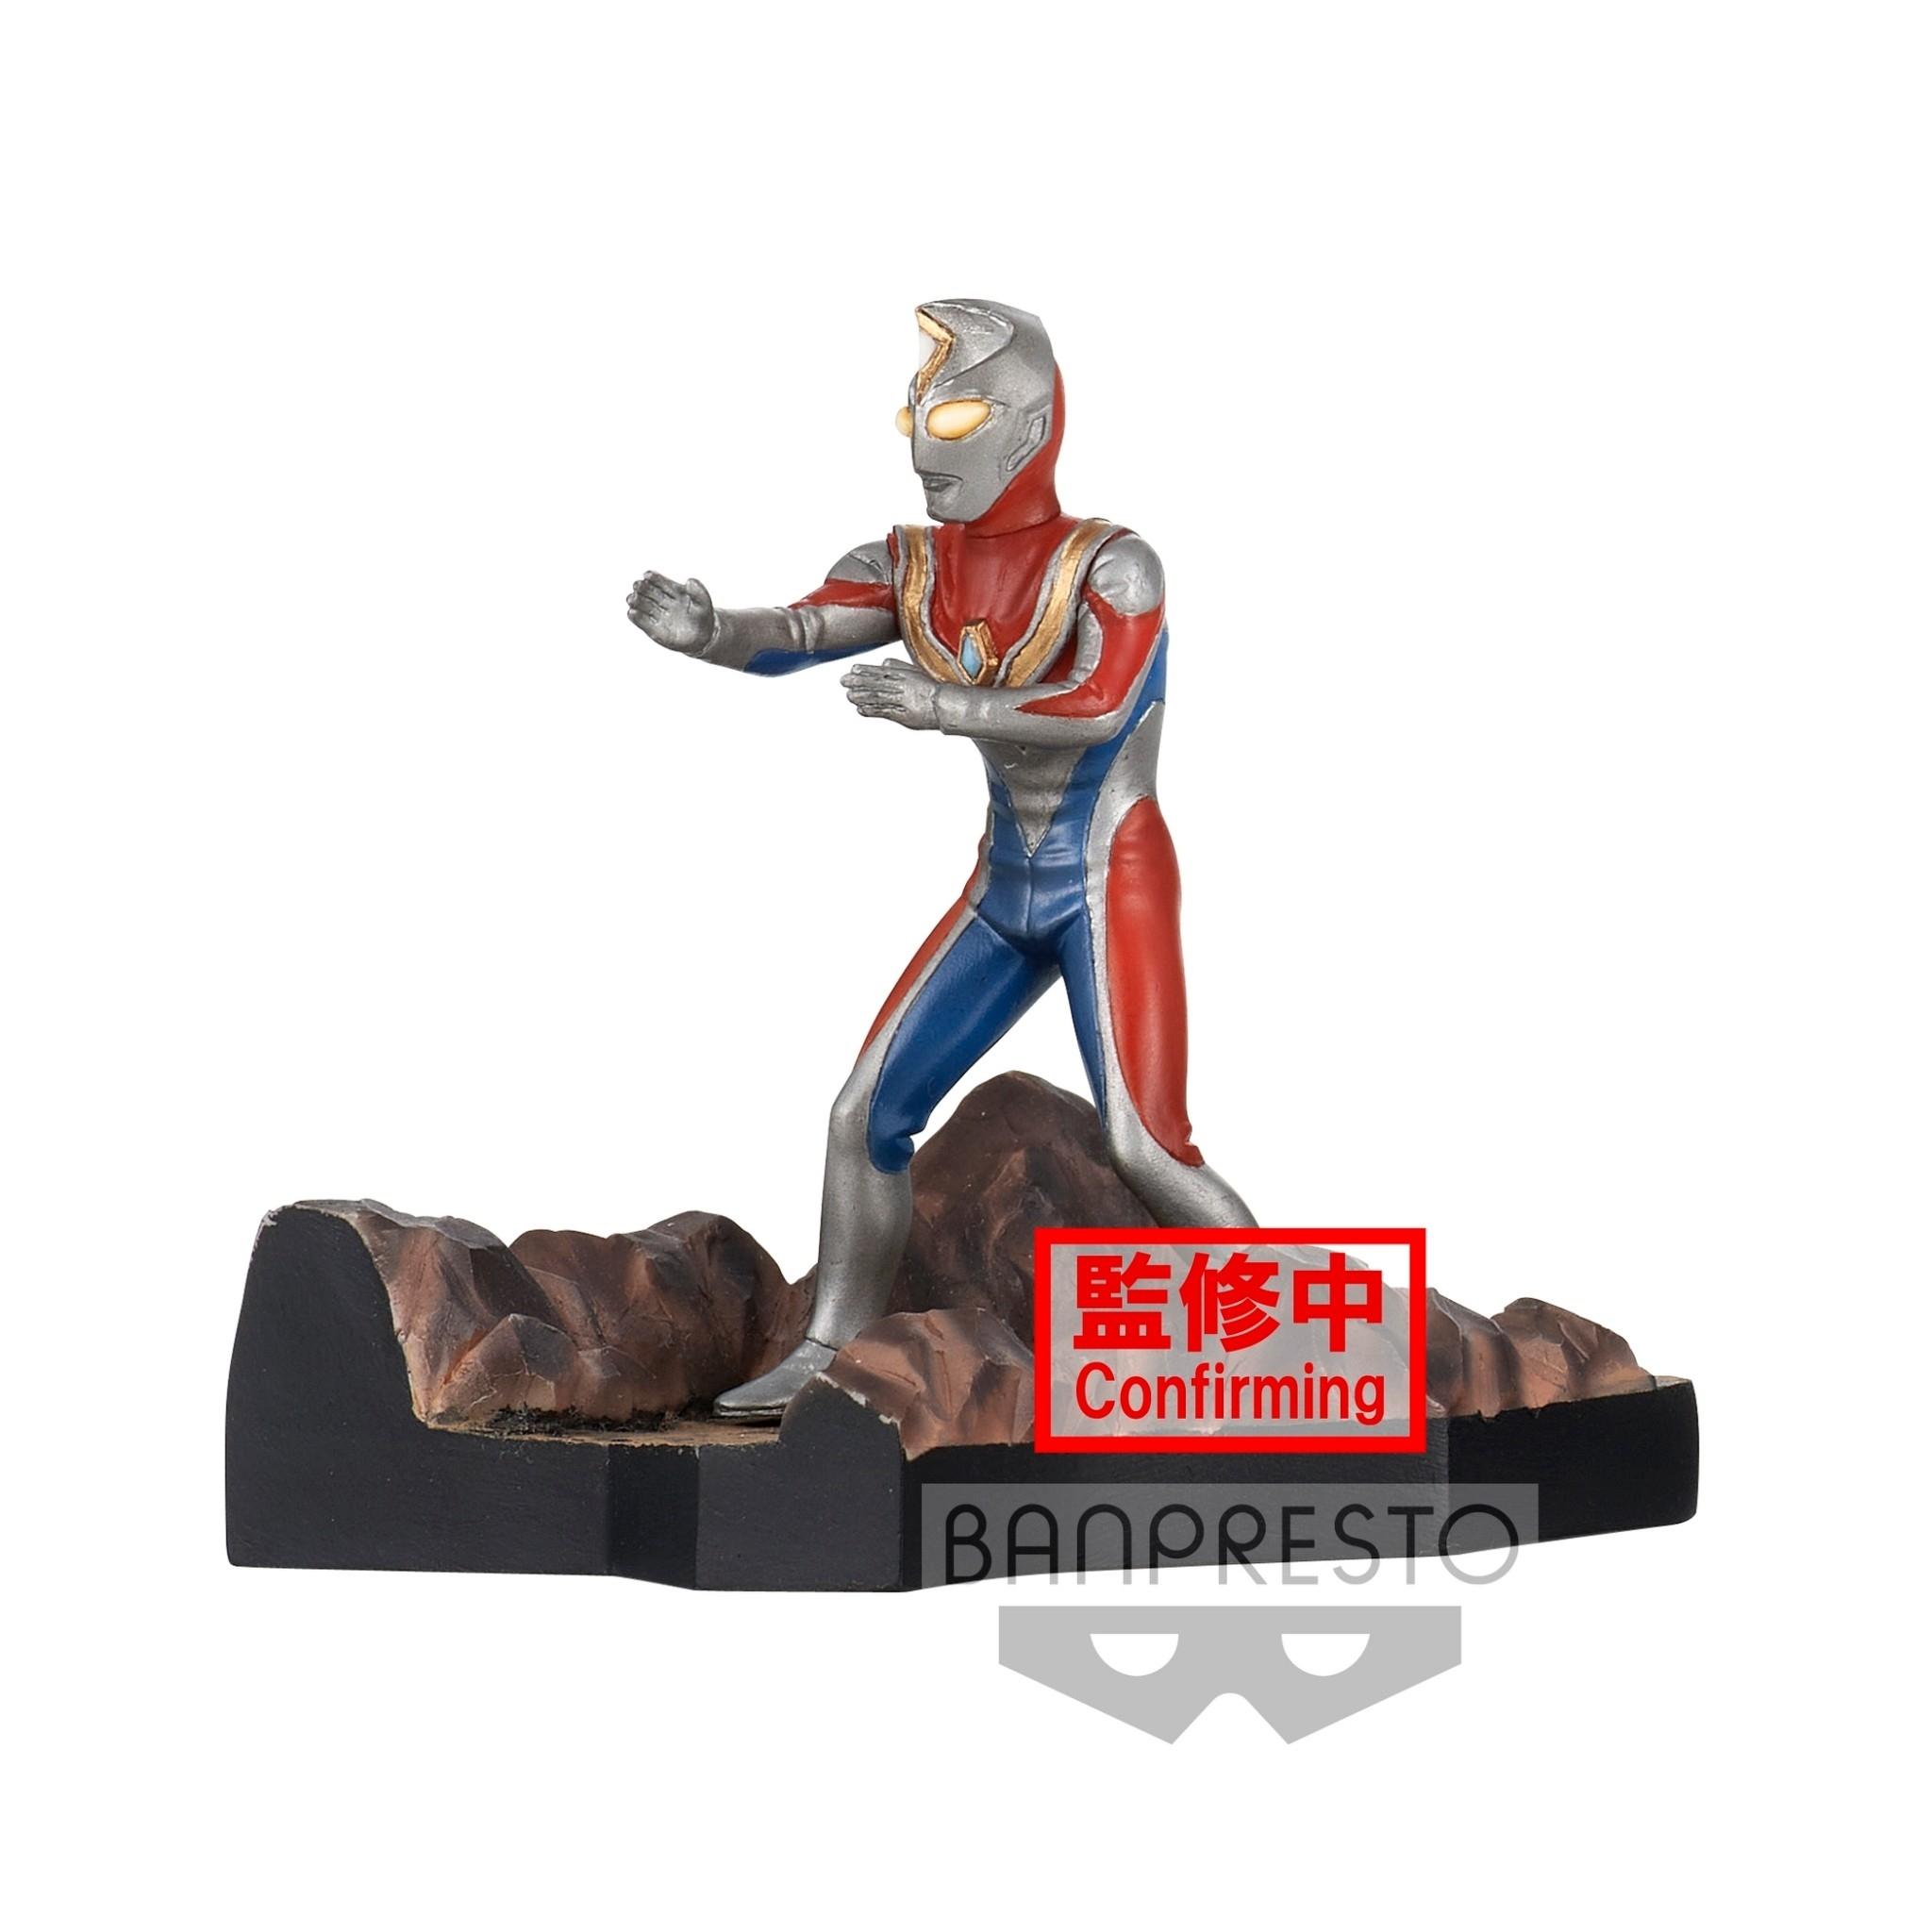 BANPRESTO|超人力霸王帝納 特攝STAGEMENT #49新的影子 (A:超人力霸王帝納)